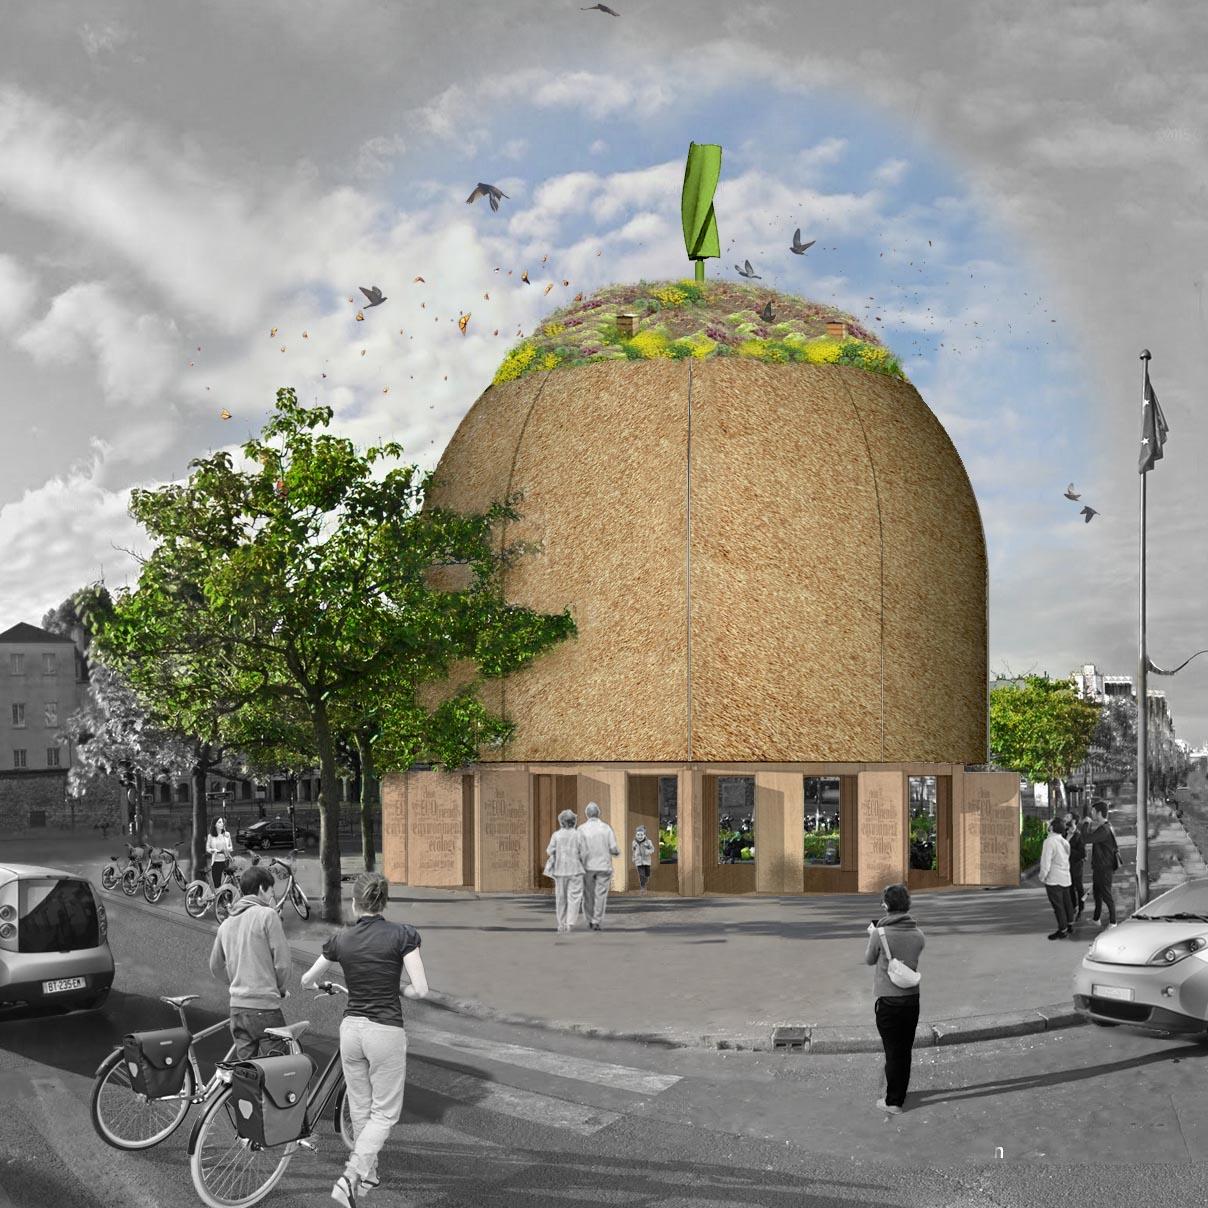 maskarade-architecture-concours-paris-COP21-ecodrome-bepos-ecoconstruction-2015-1208